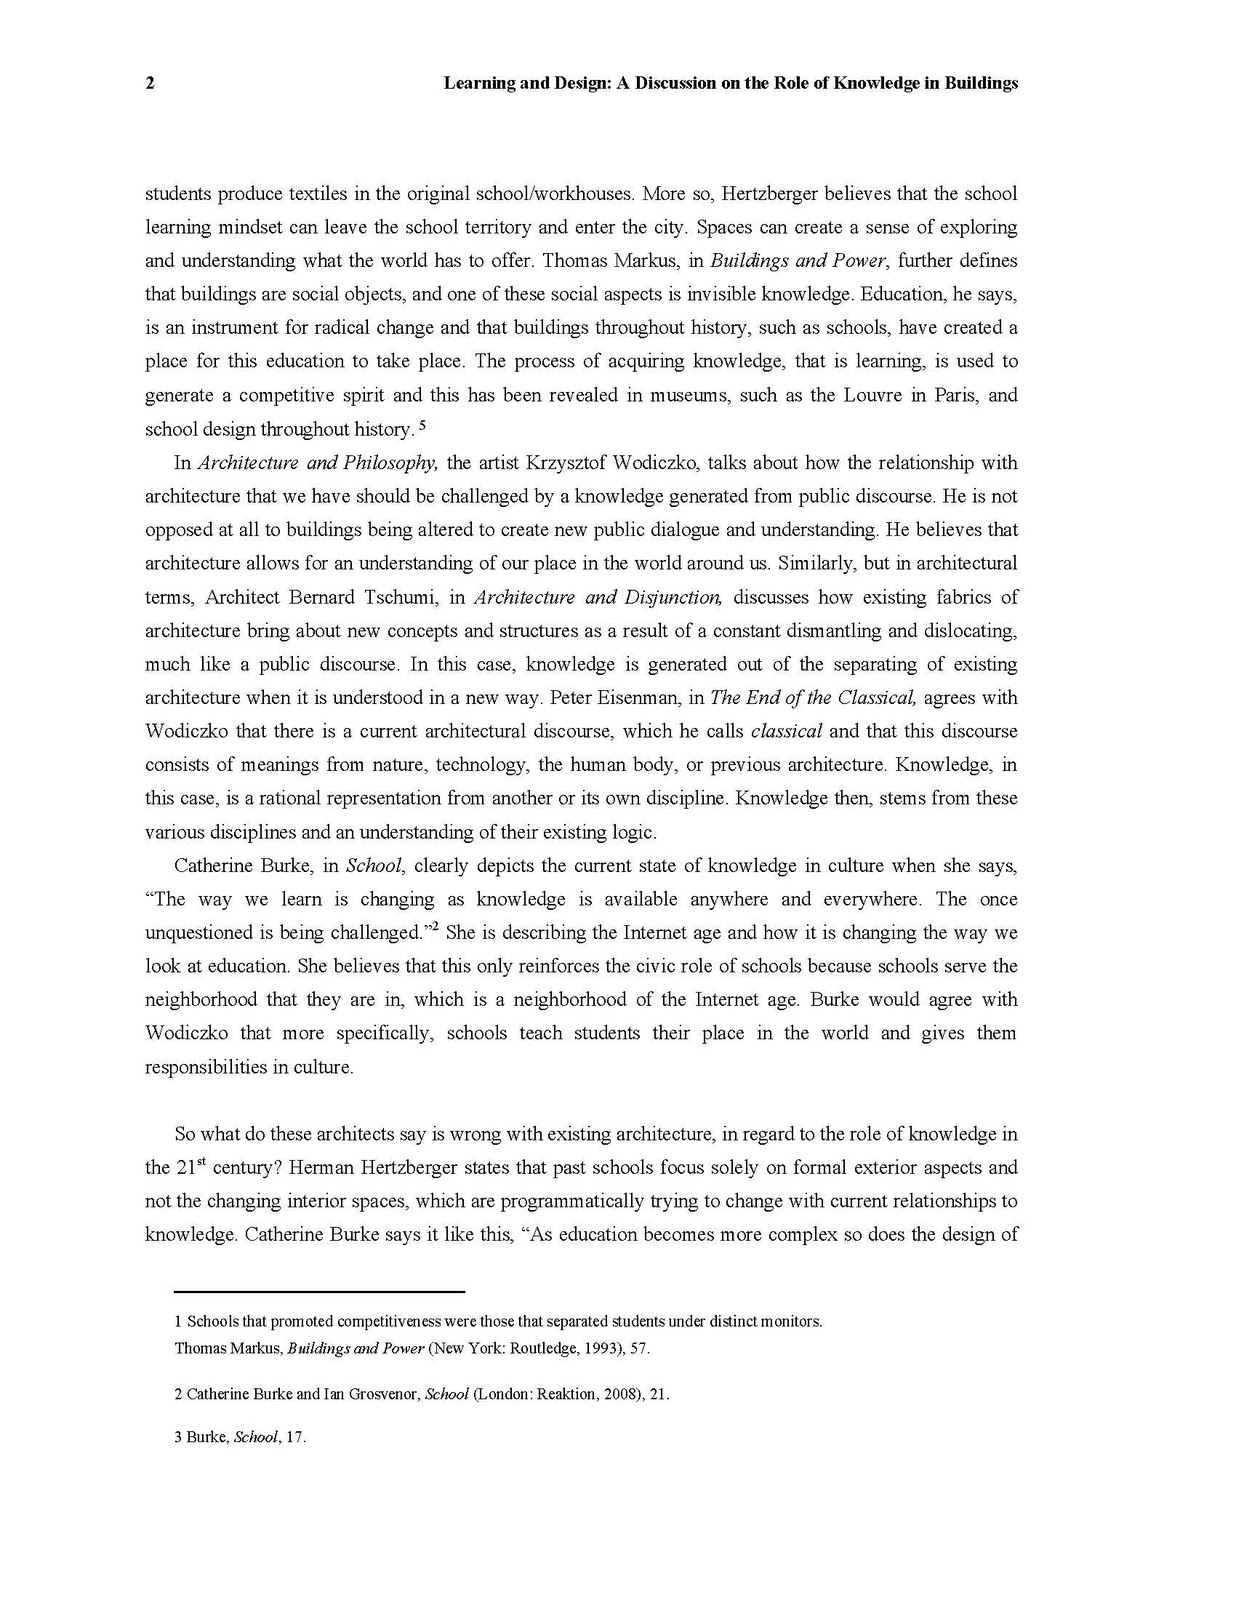 001 u2shuebtjf essay example sample